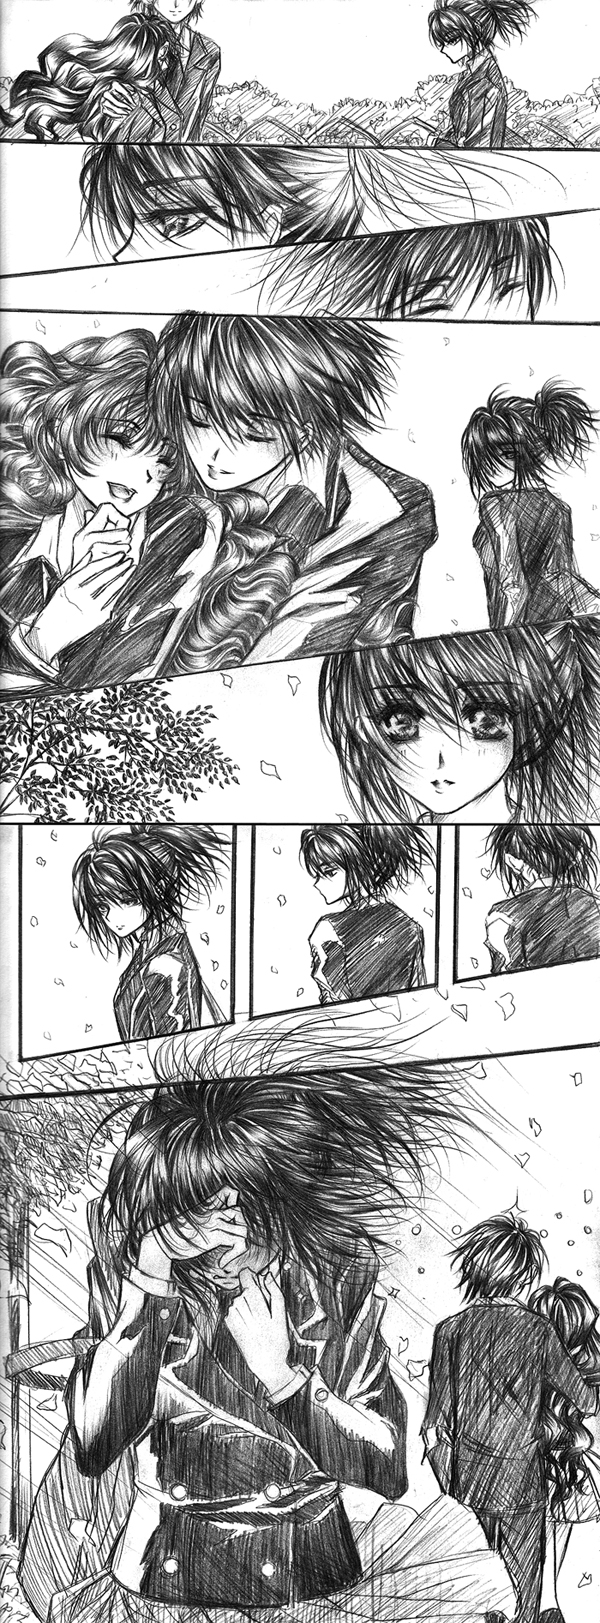 Manga Sketch by Florineil-chan